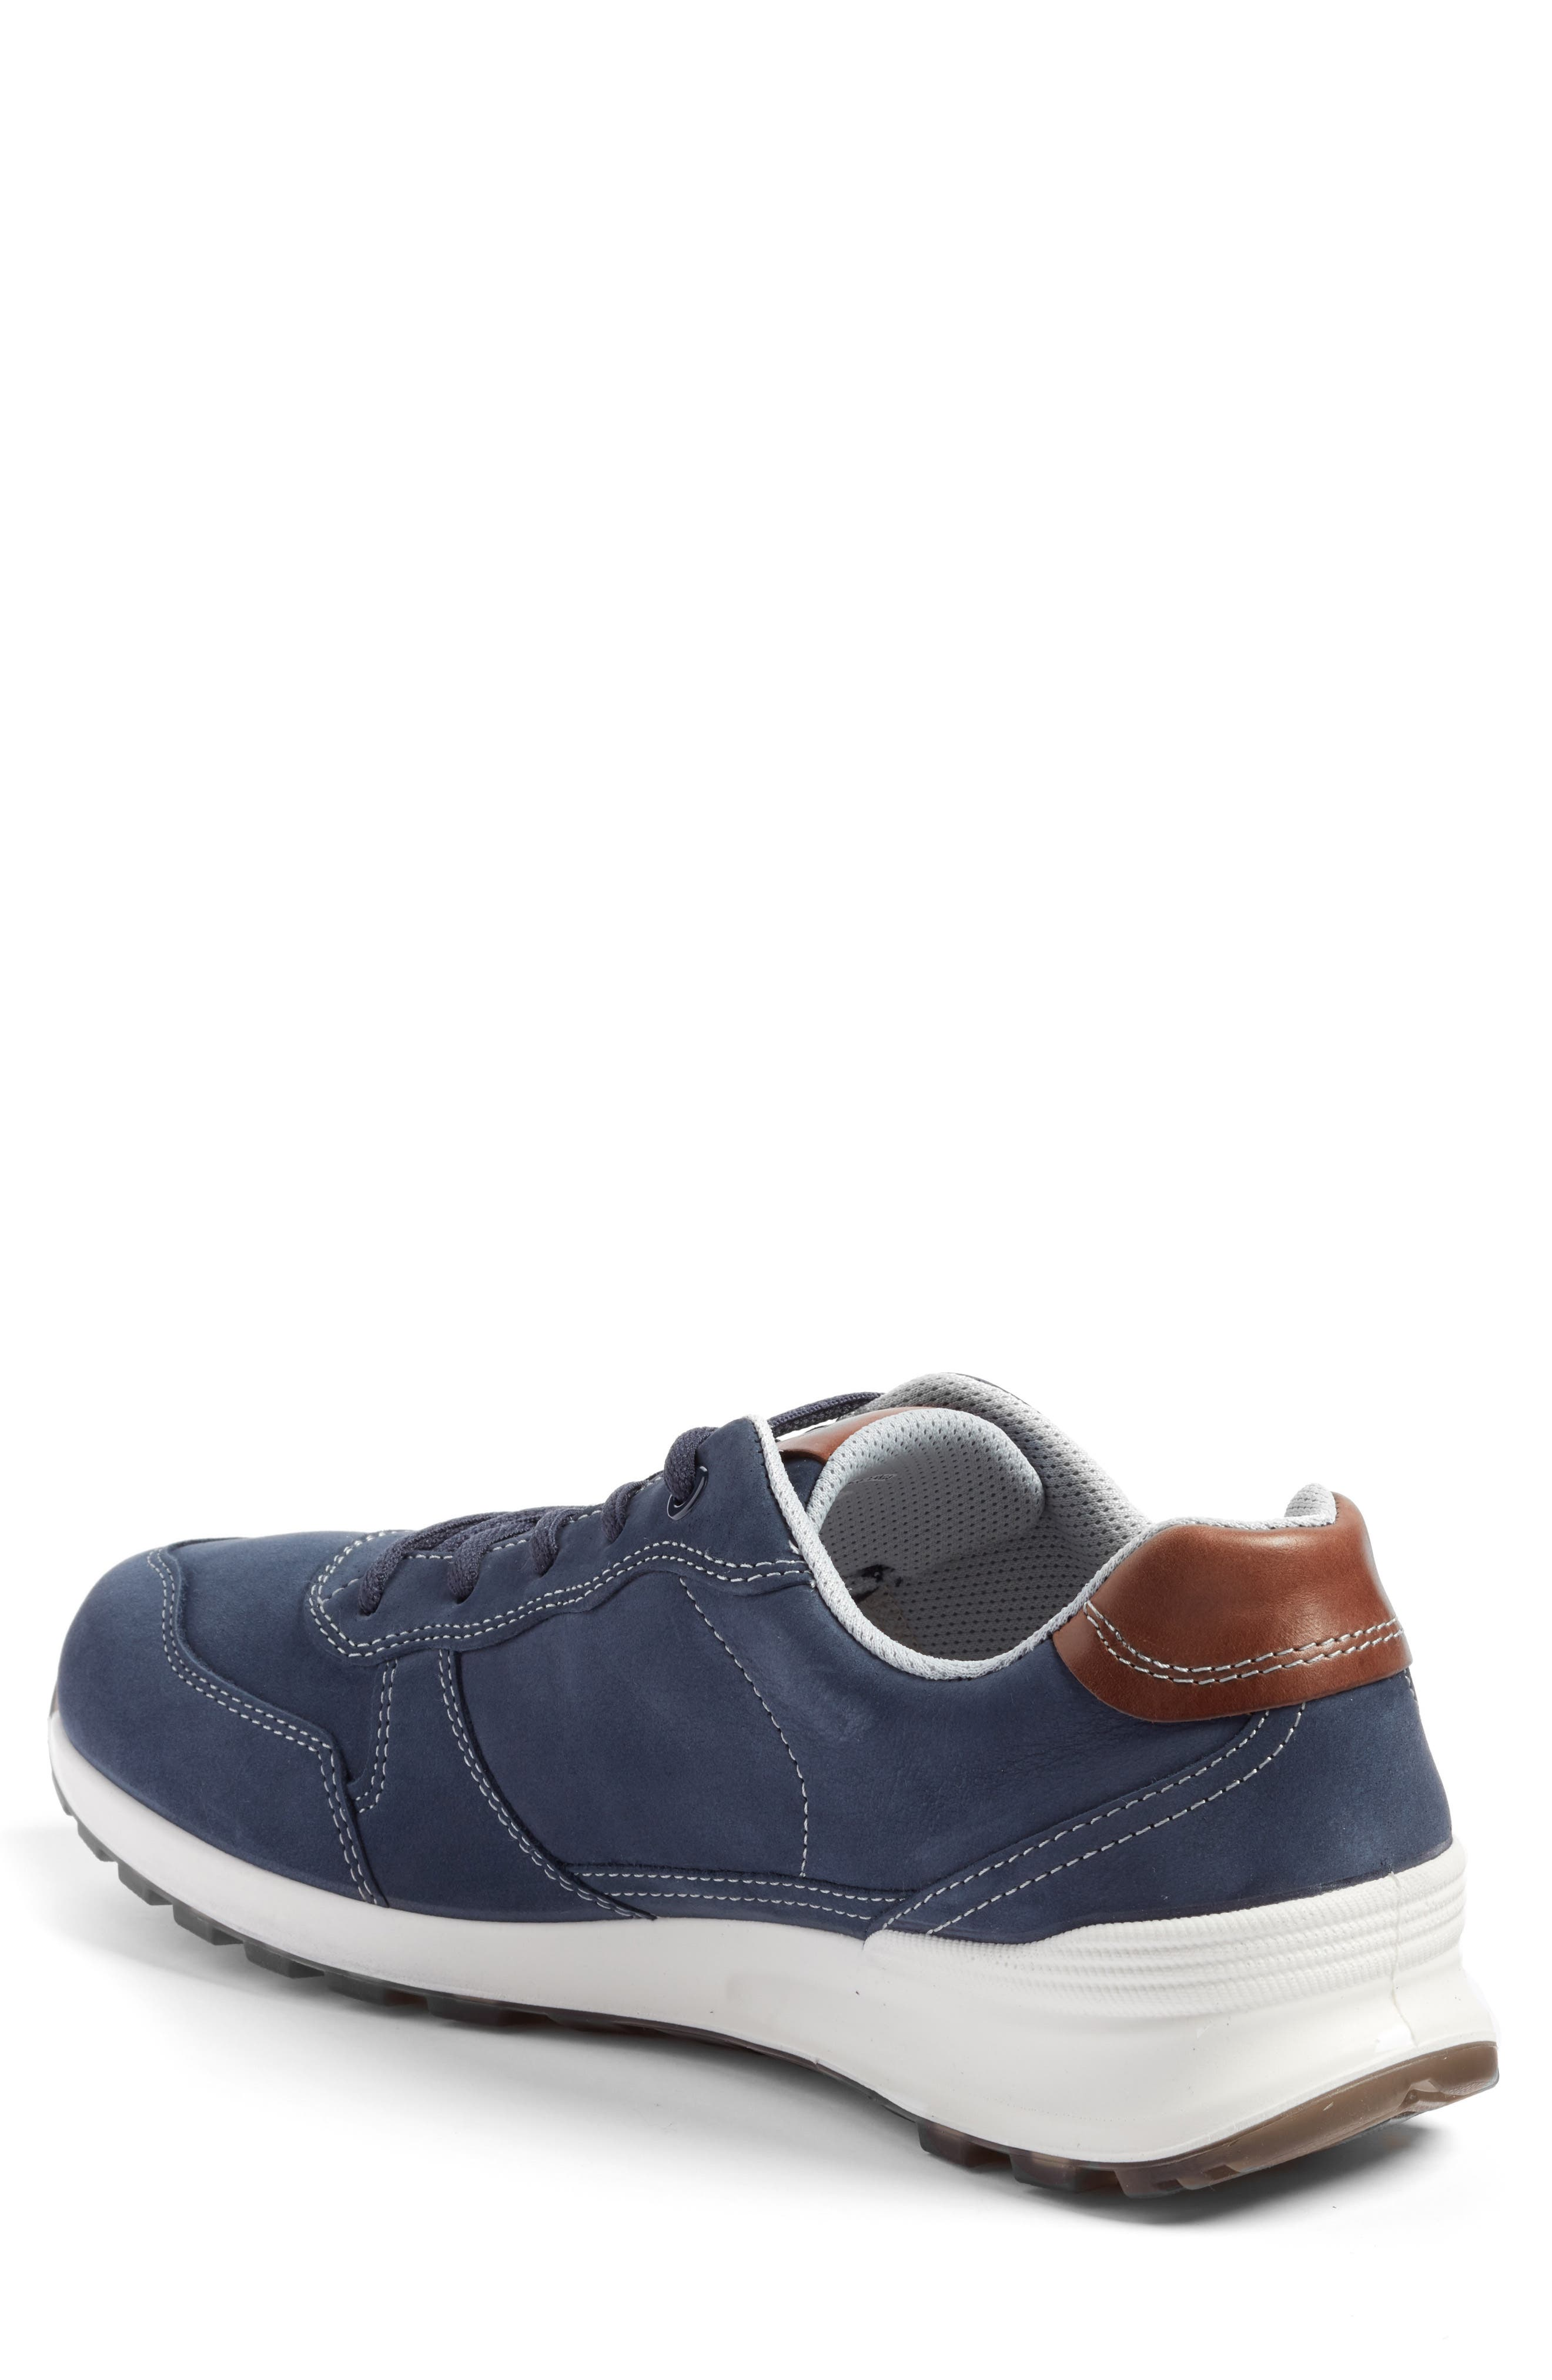 CS14 Retro Sneaker,                             Alternate thumbnail 3, color,